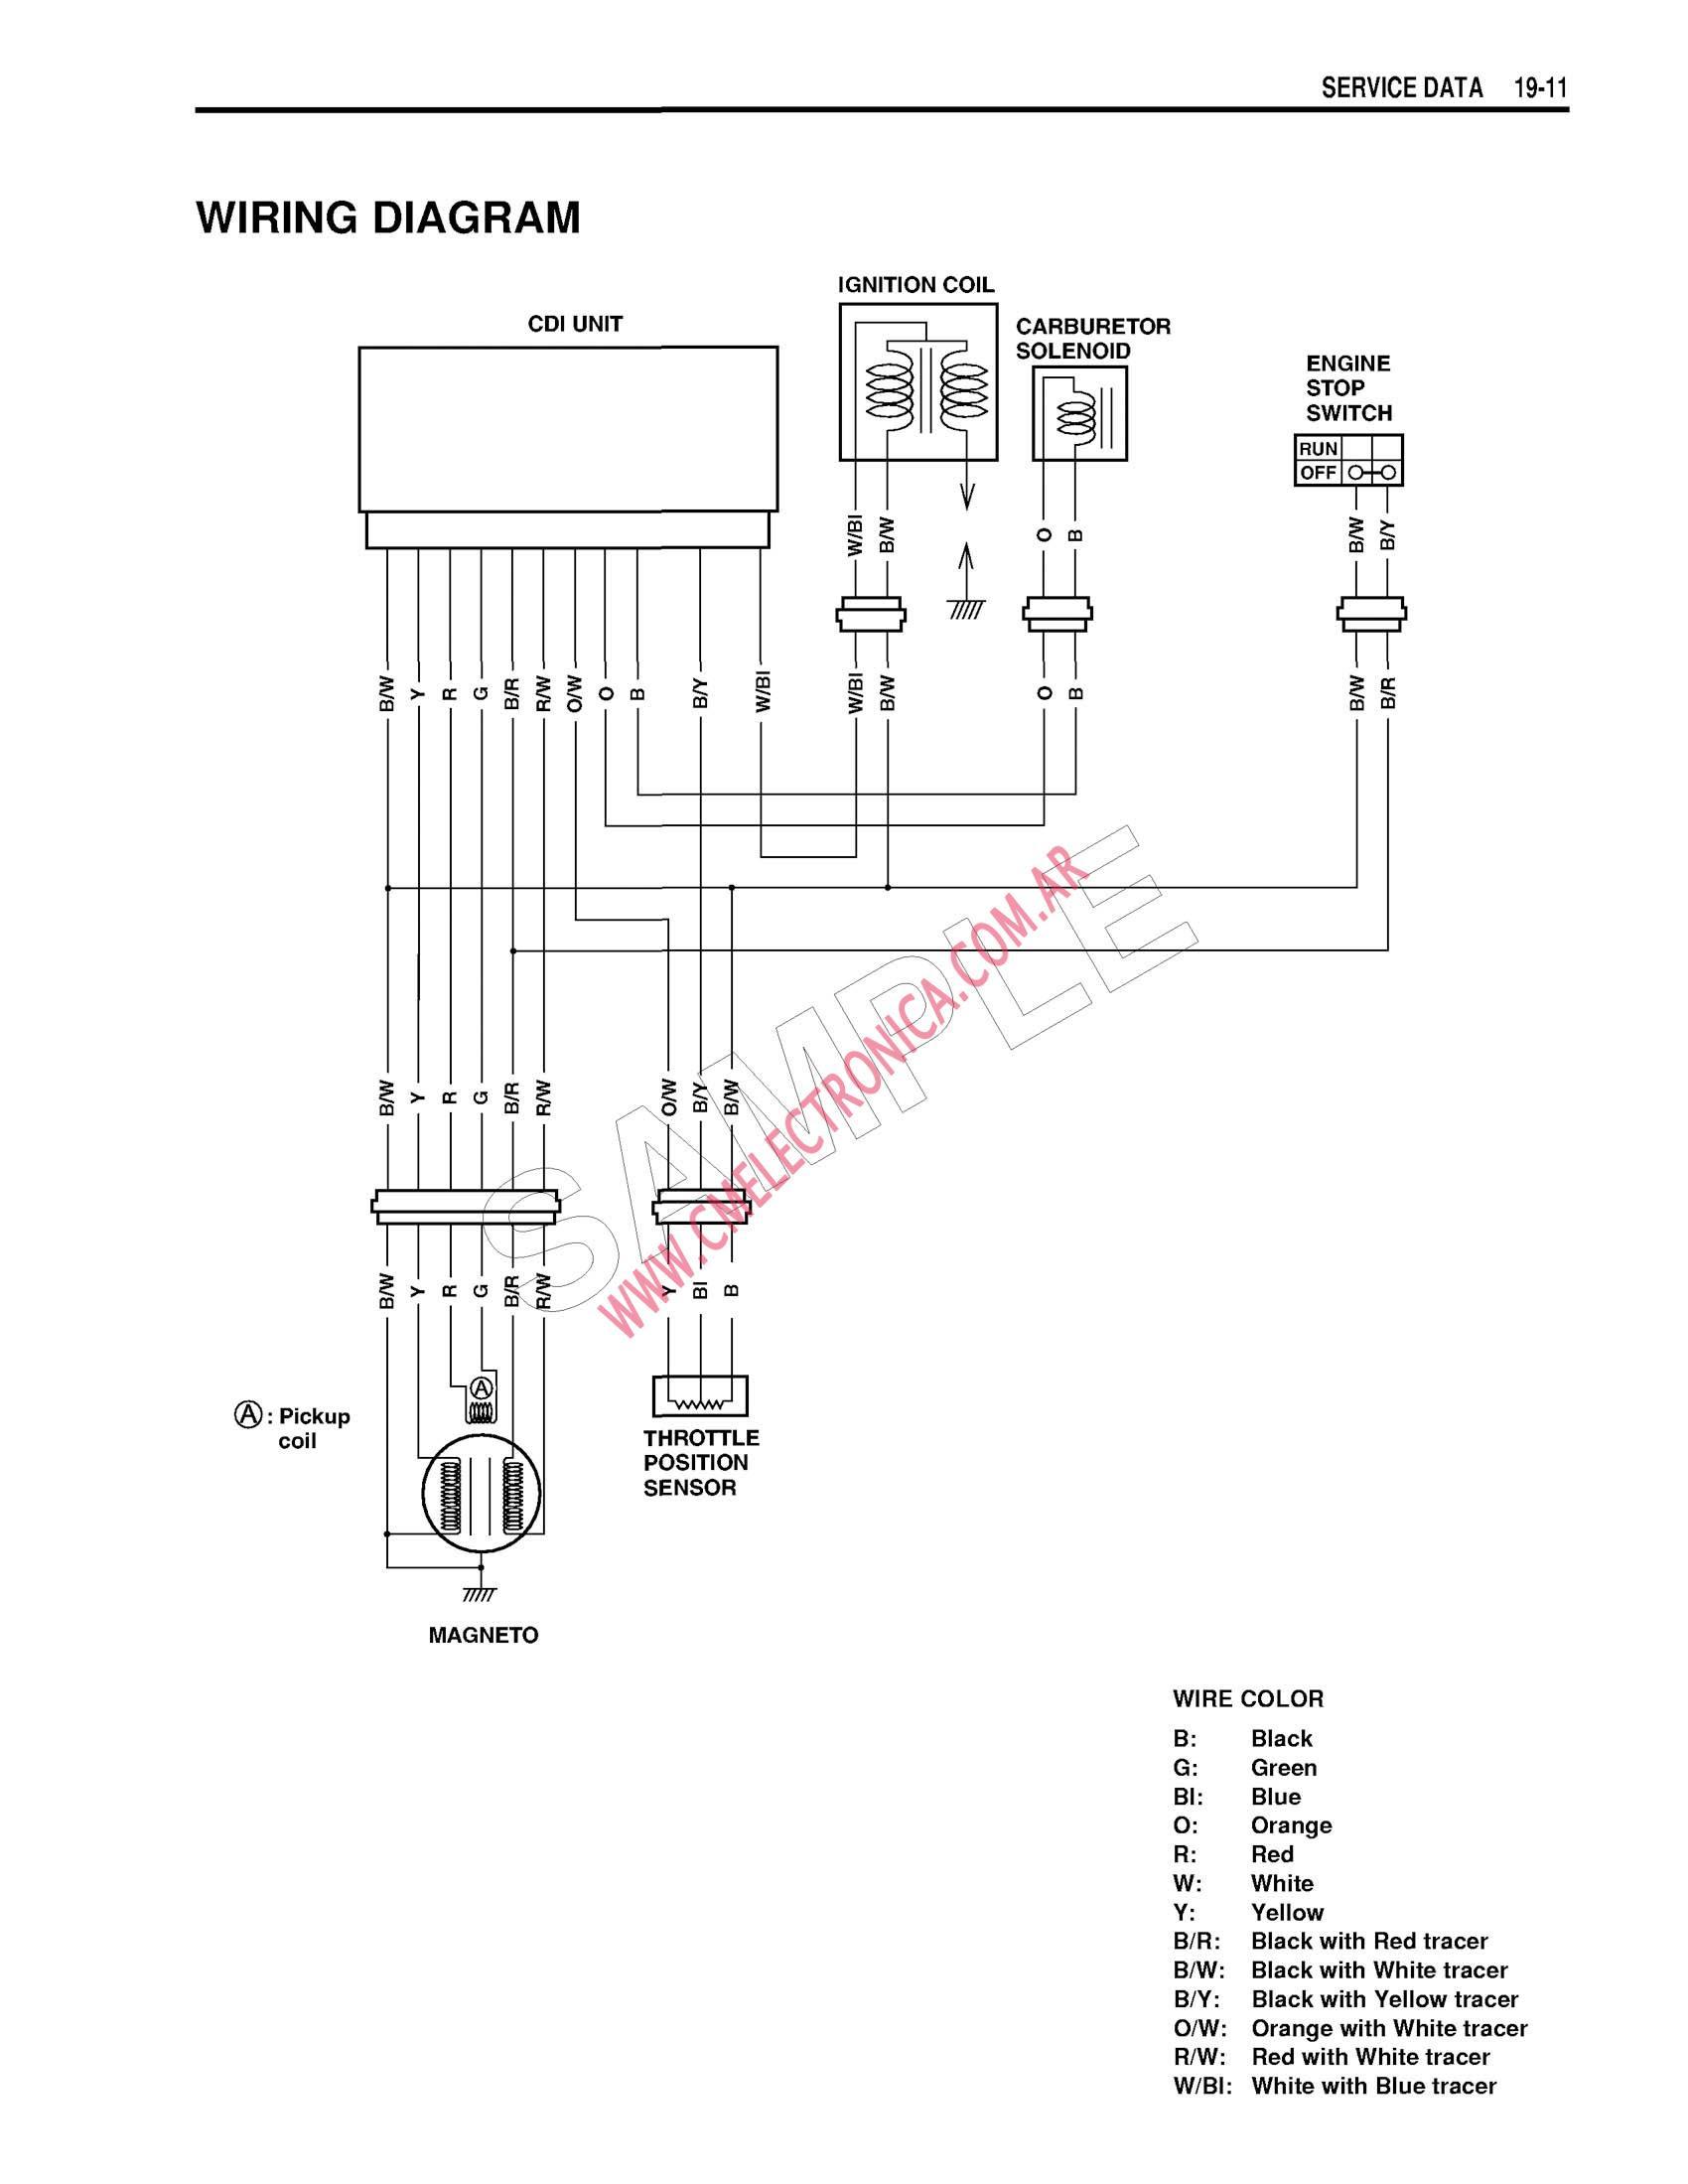 Diagram Wiring Diagram 2000 Suzuki Rm Full Version Hd Quality Suzuki Rm Onlinediagramk Nuovarmata It